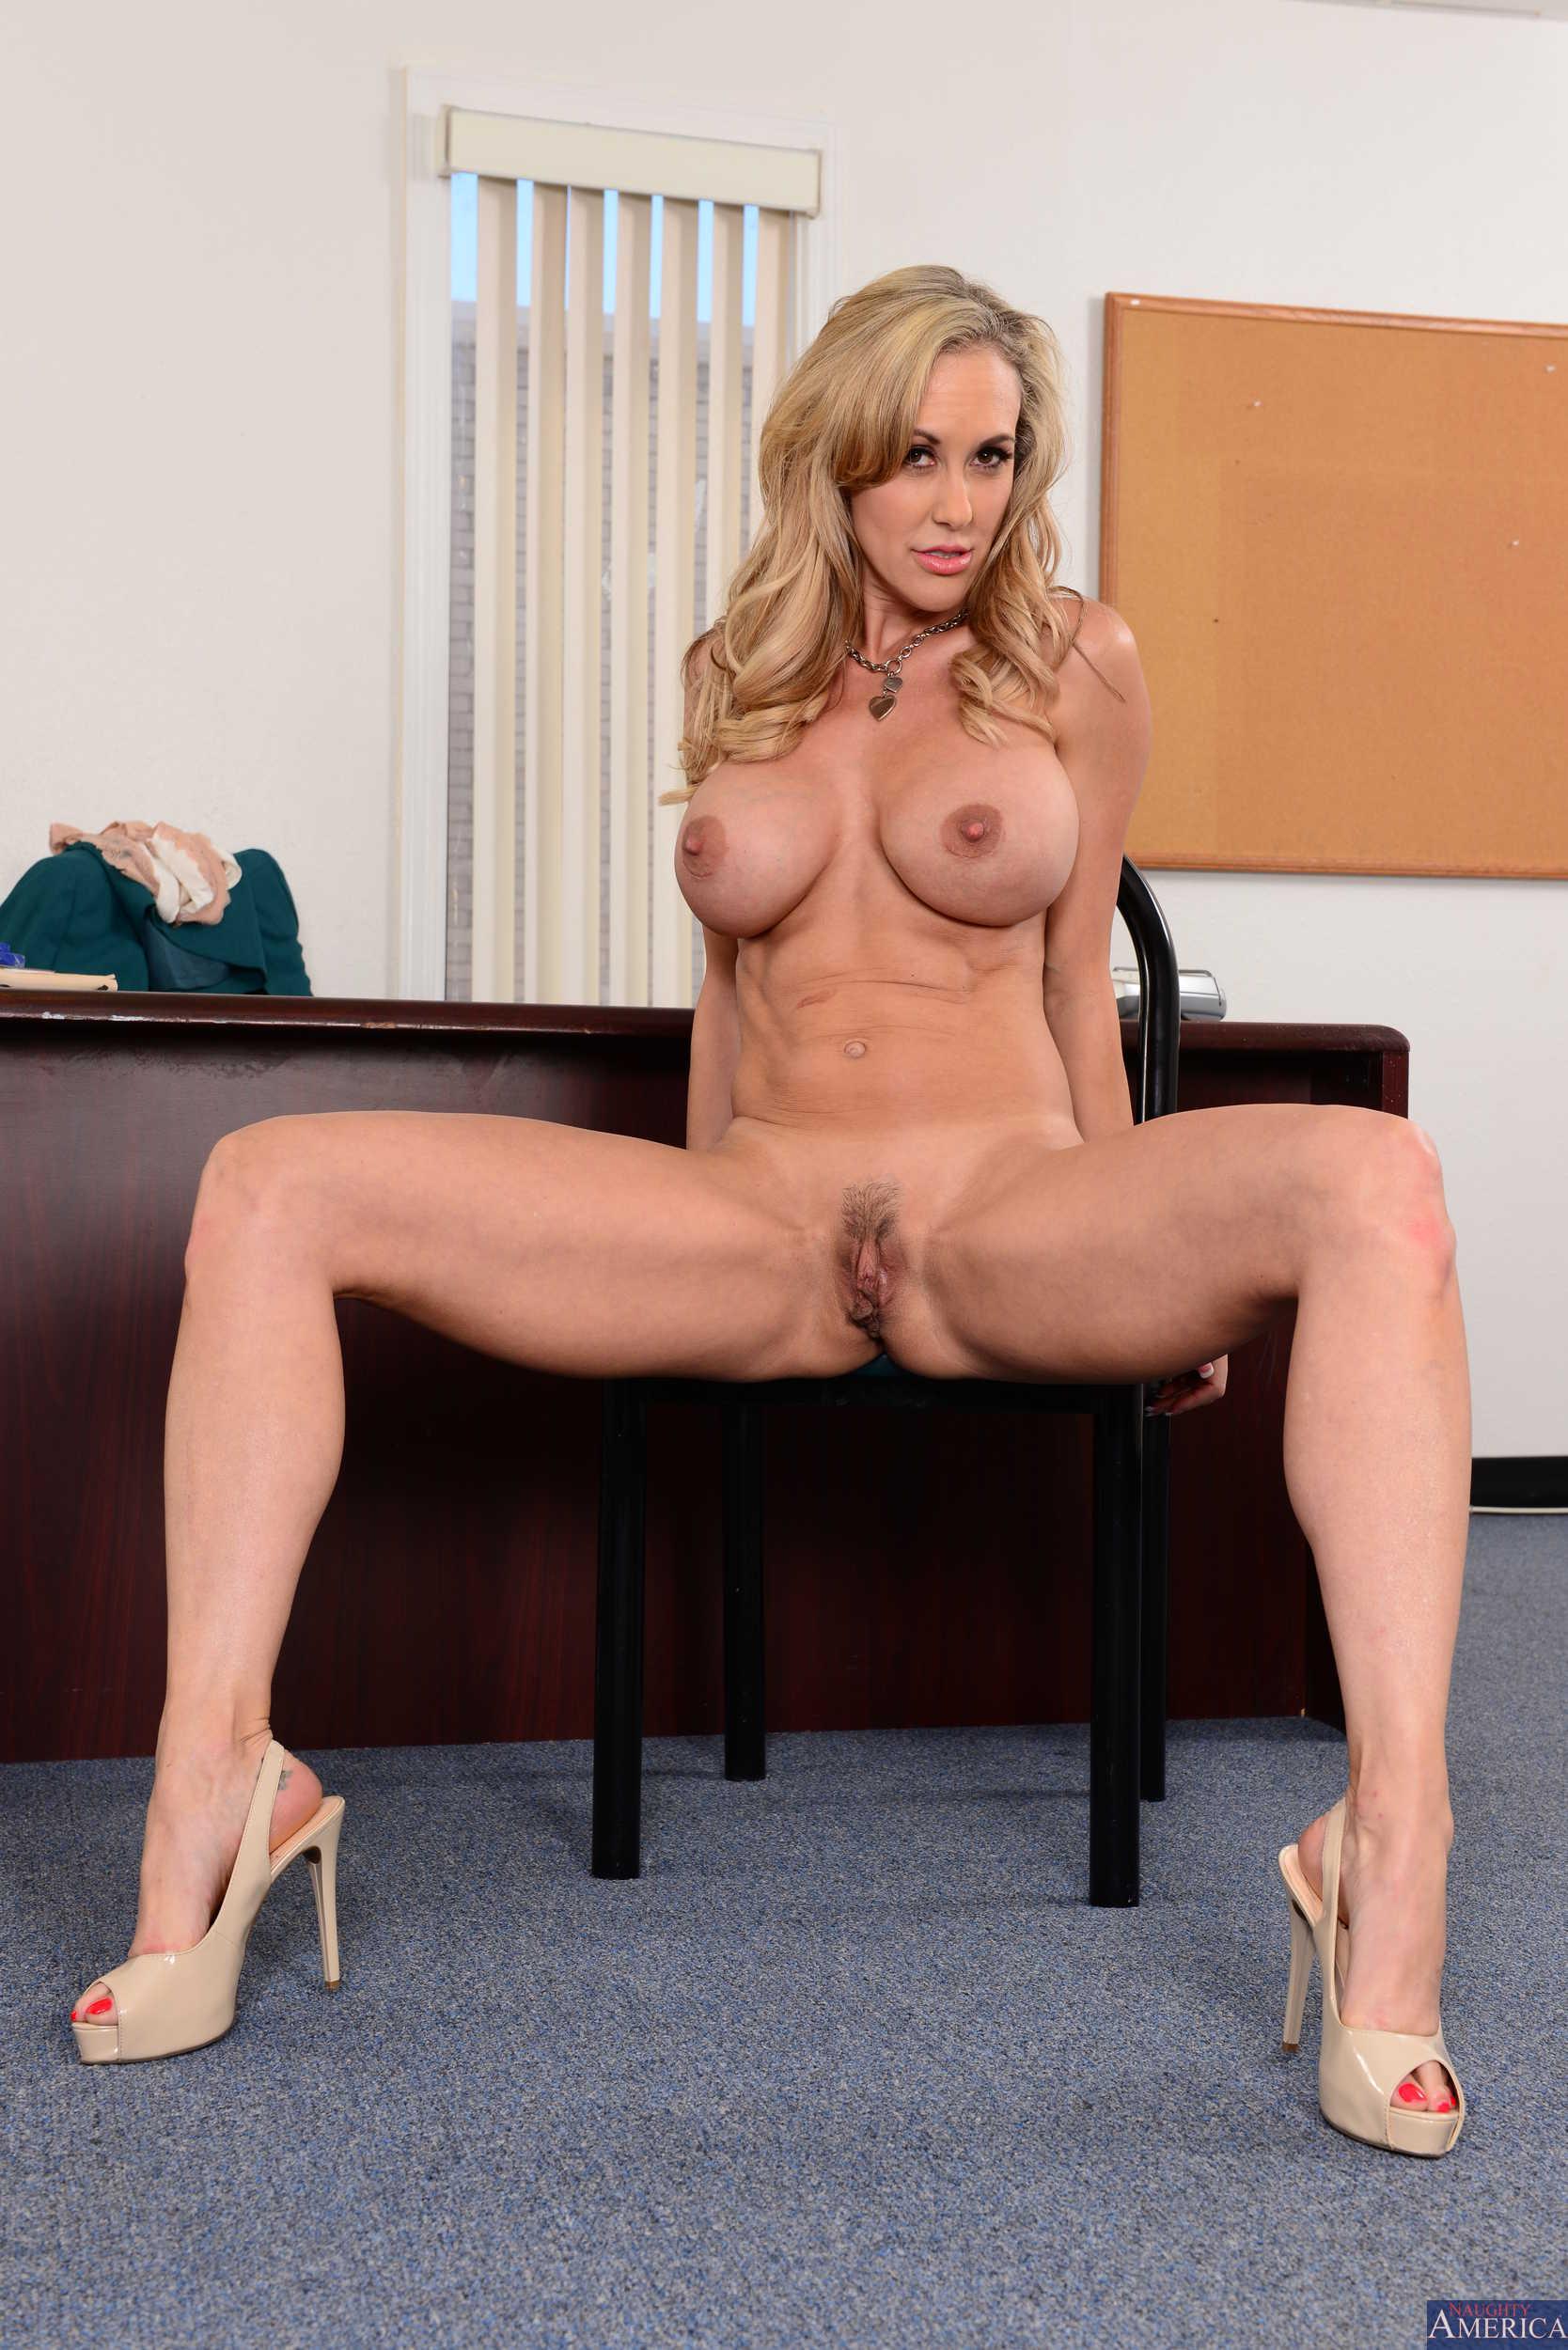 Hot Ass Pornstar Brandi Love - Free Porn from Ok Fap!